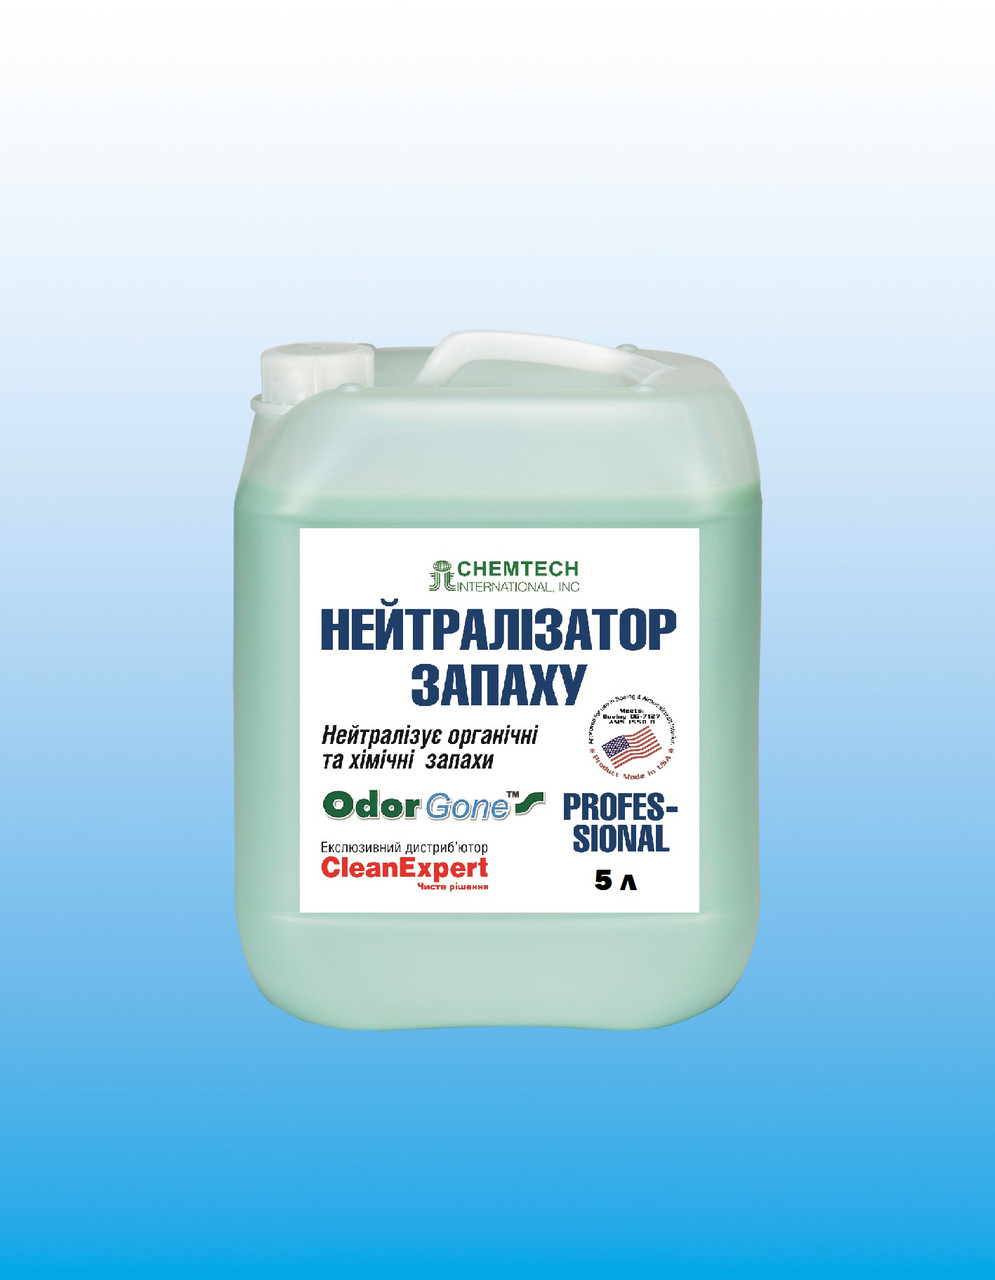 Нейтралізатор неприємного запаху Chemtech international Odorgone Professional 5 л. (Одоргон)